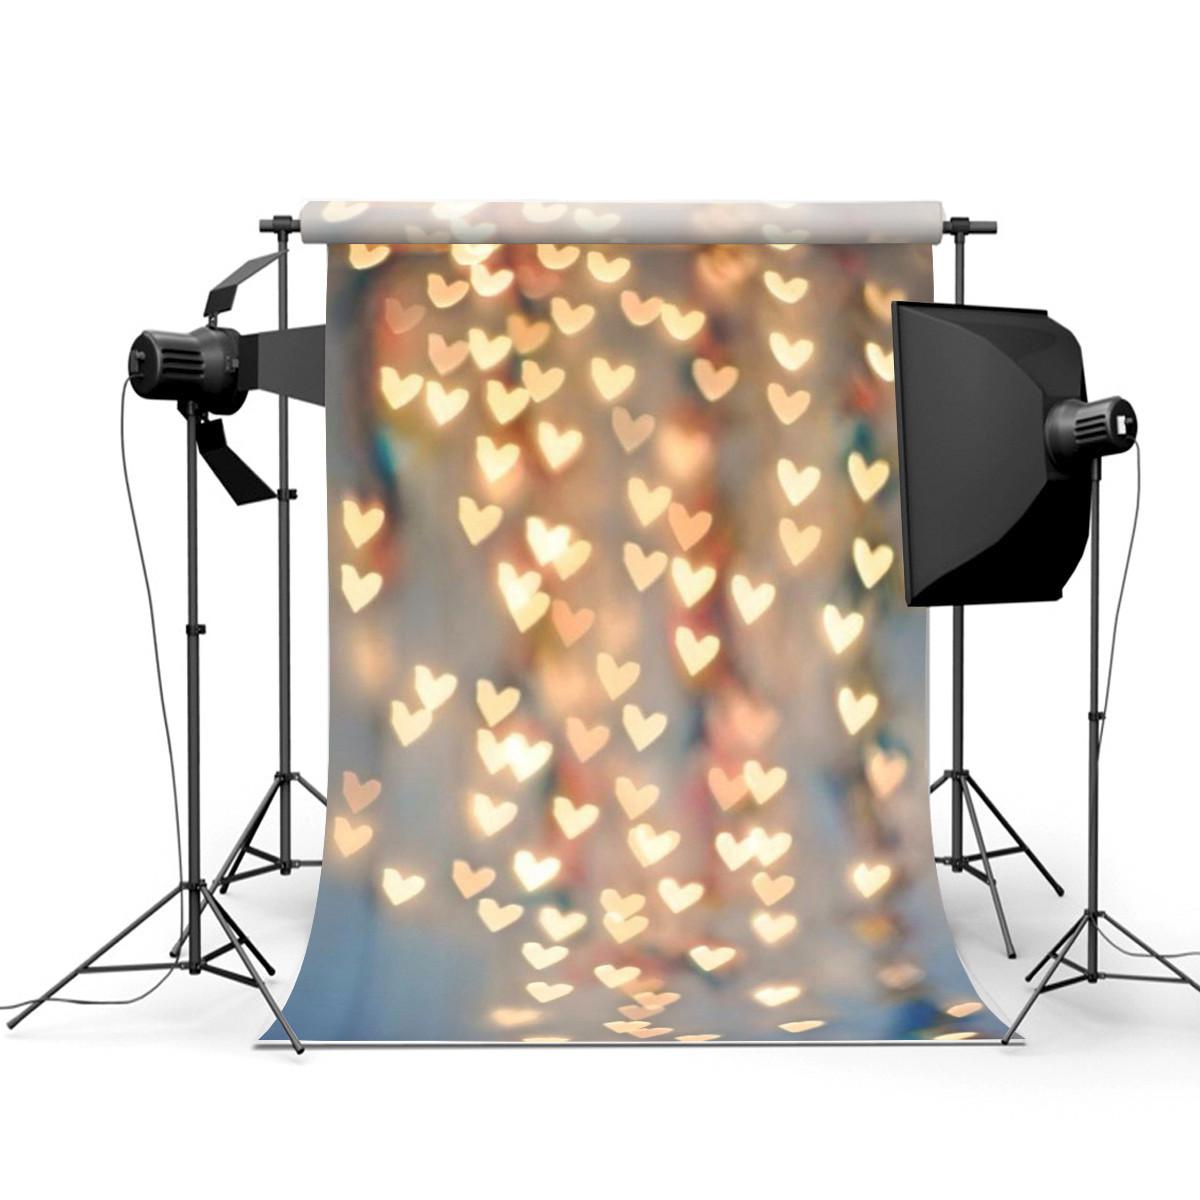 toile de fond backdrop tissu photographie studio photo halo coeur achat vente fond de. Black Bedroom Furniture Sets. Home Design Ideas